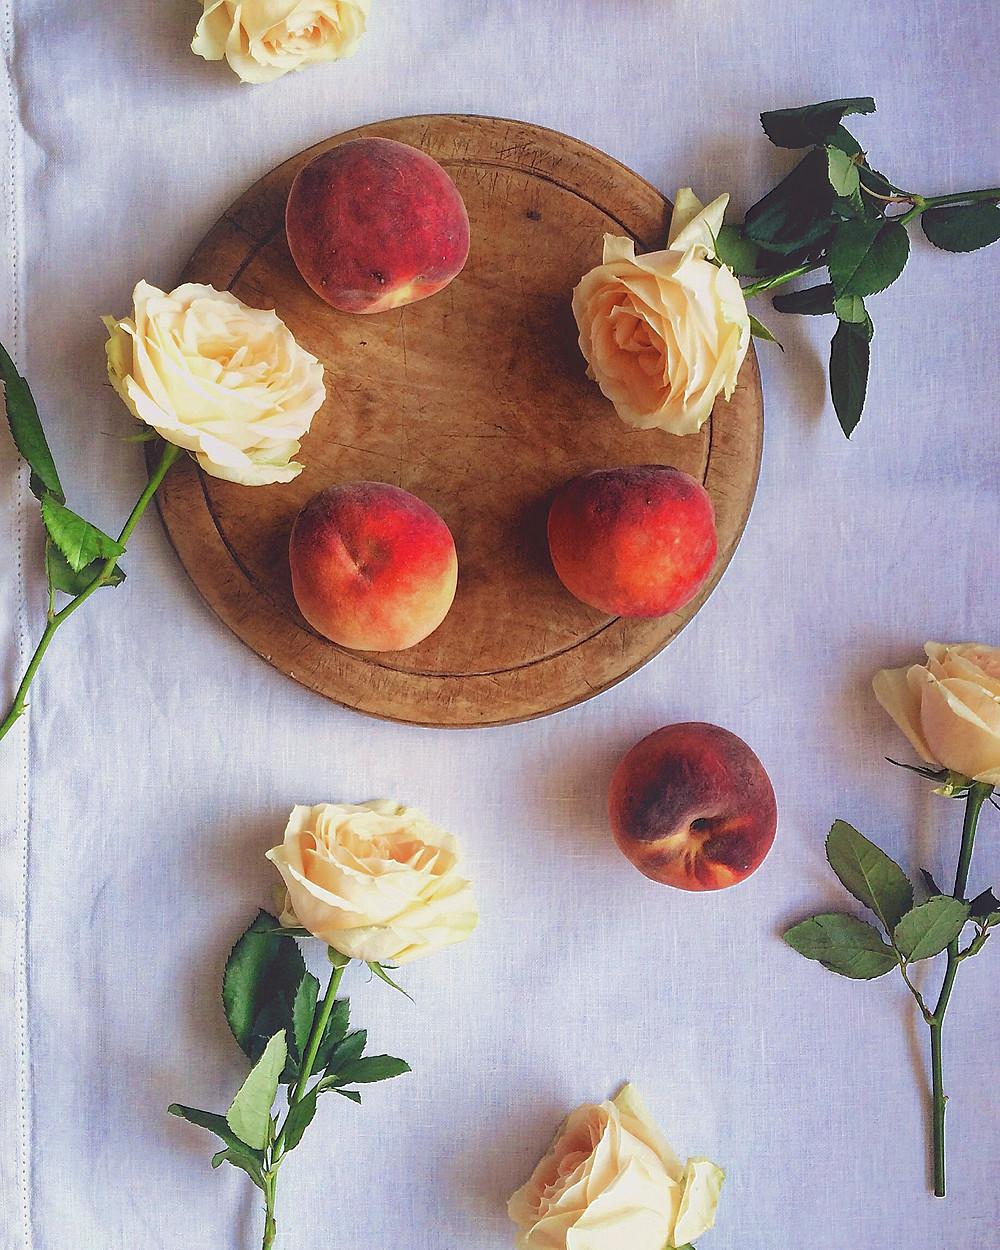 Peaches and Peach Roses - Sky Meadow Bakery blog